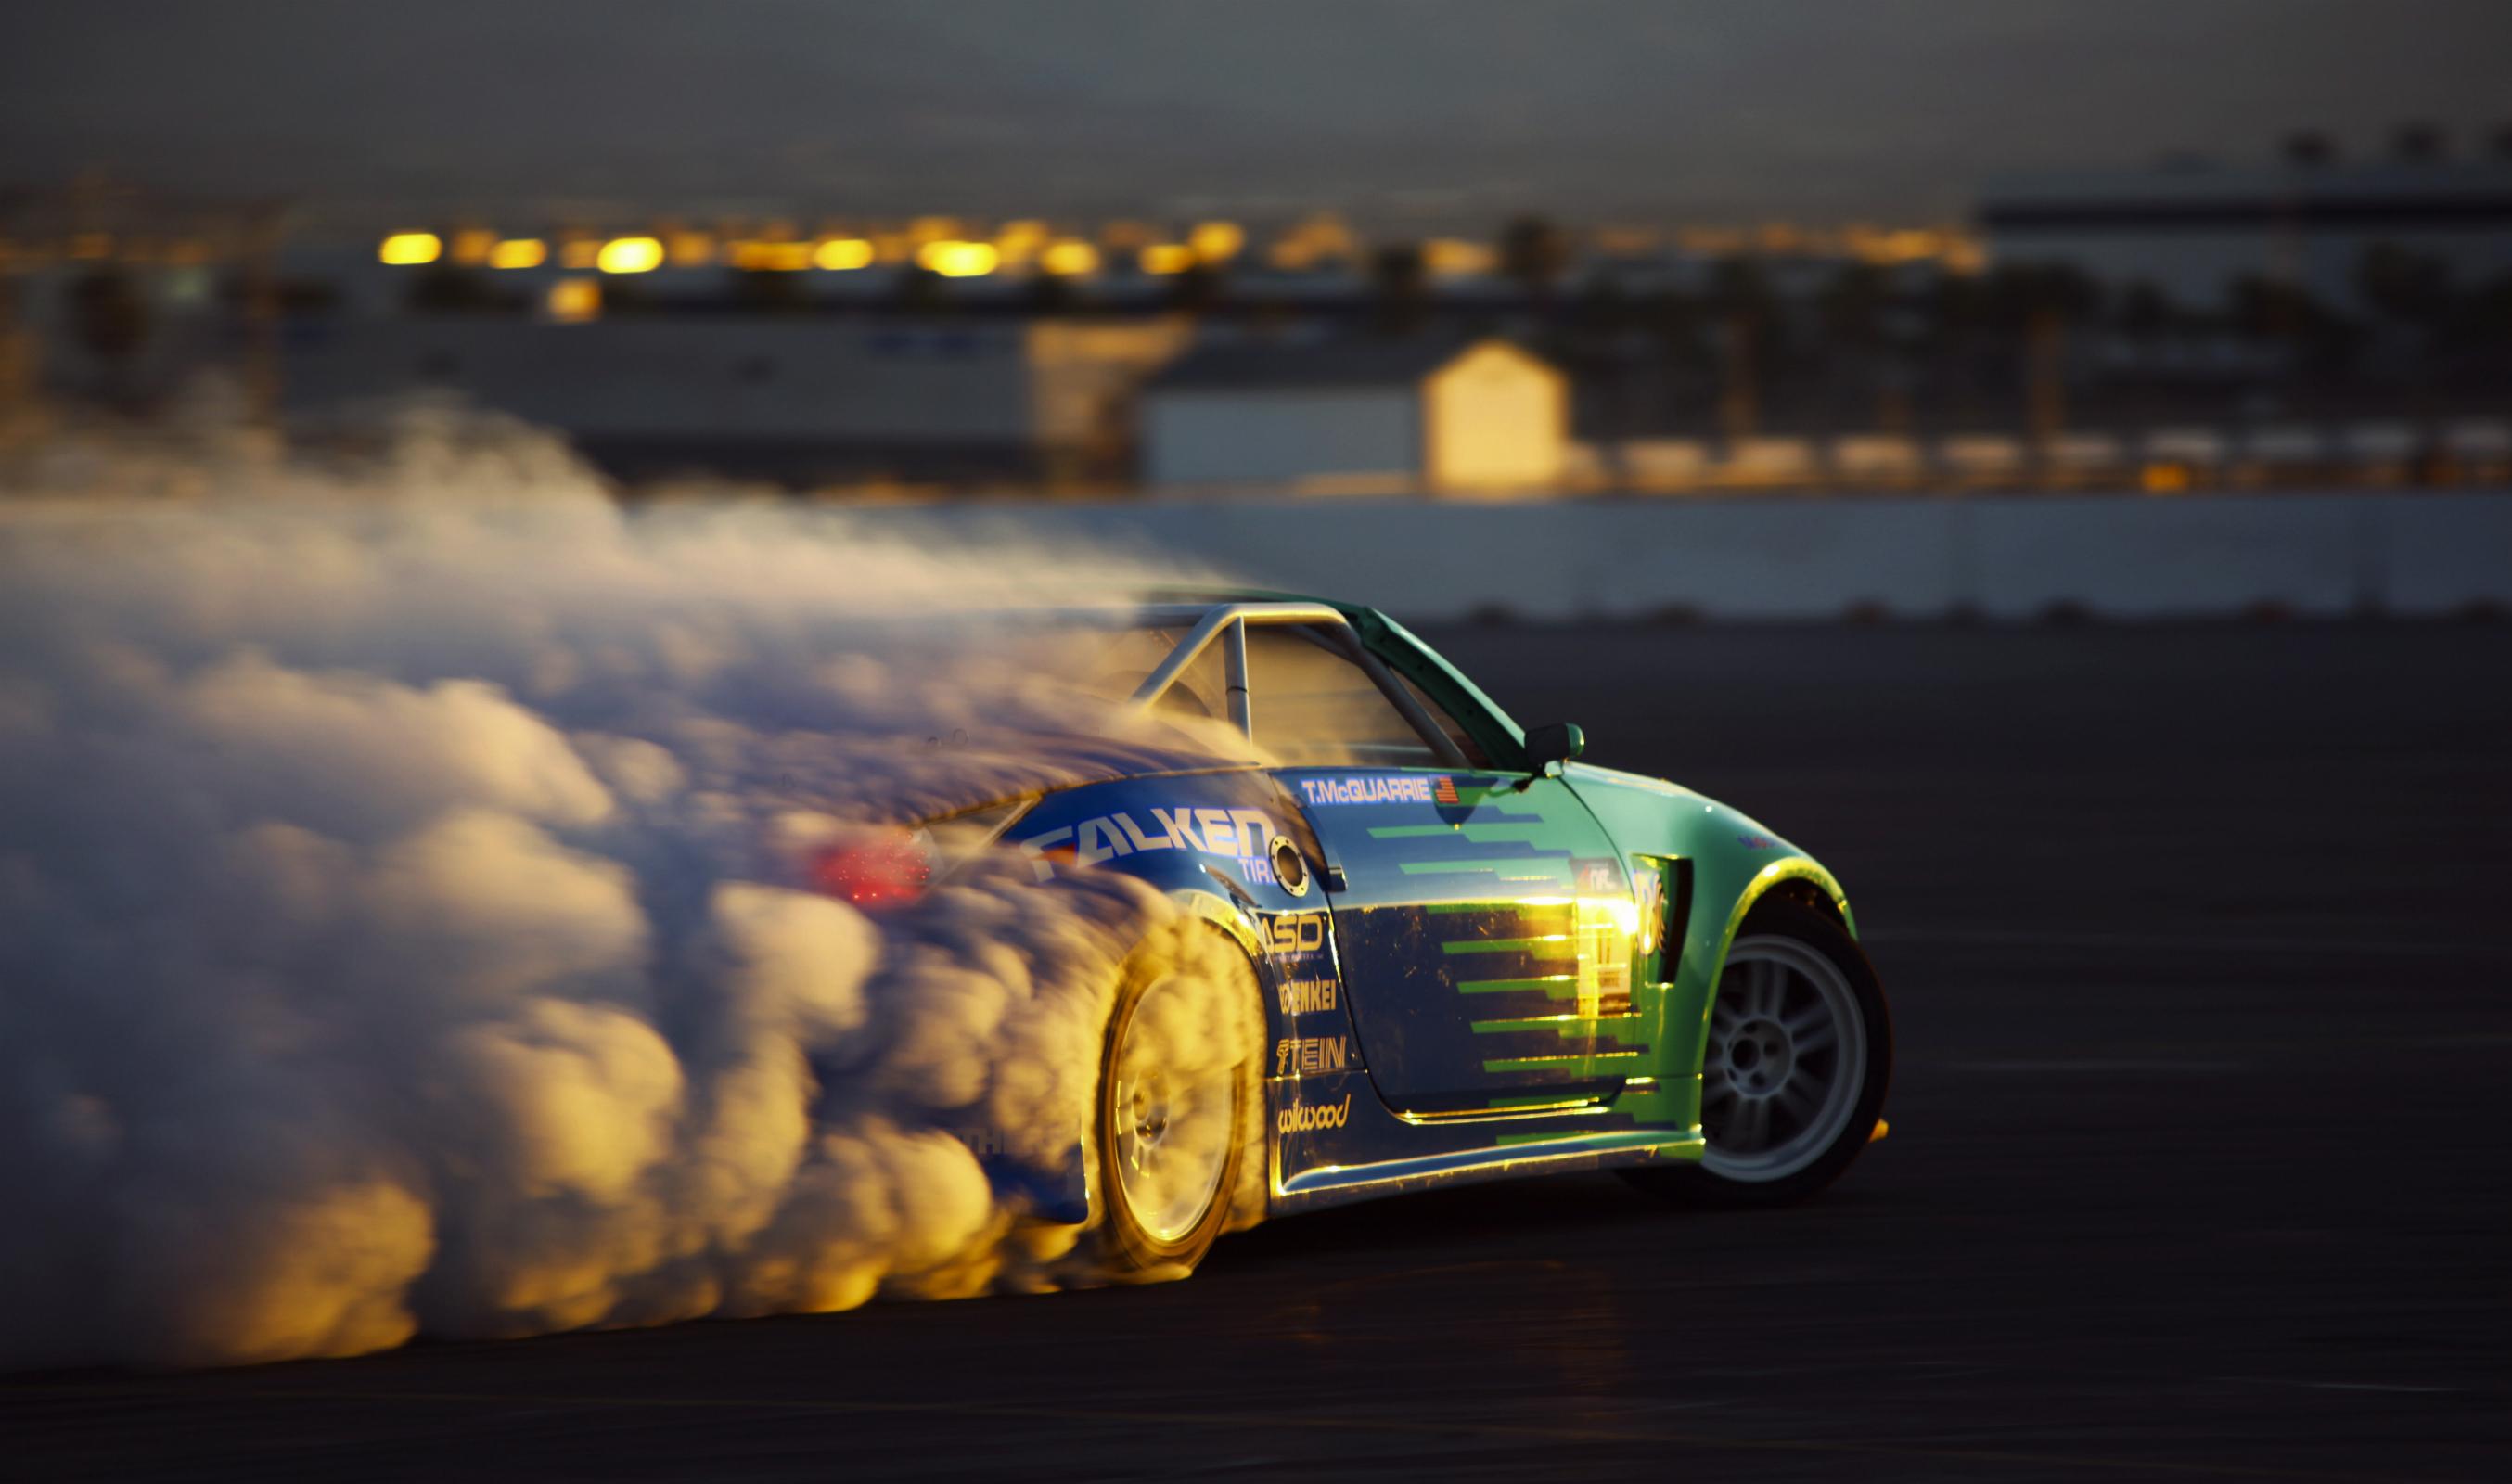 HD Racing Wallpaper